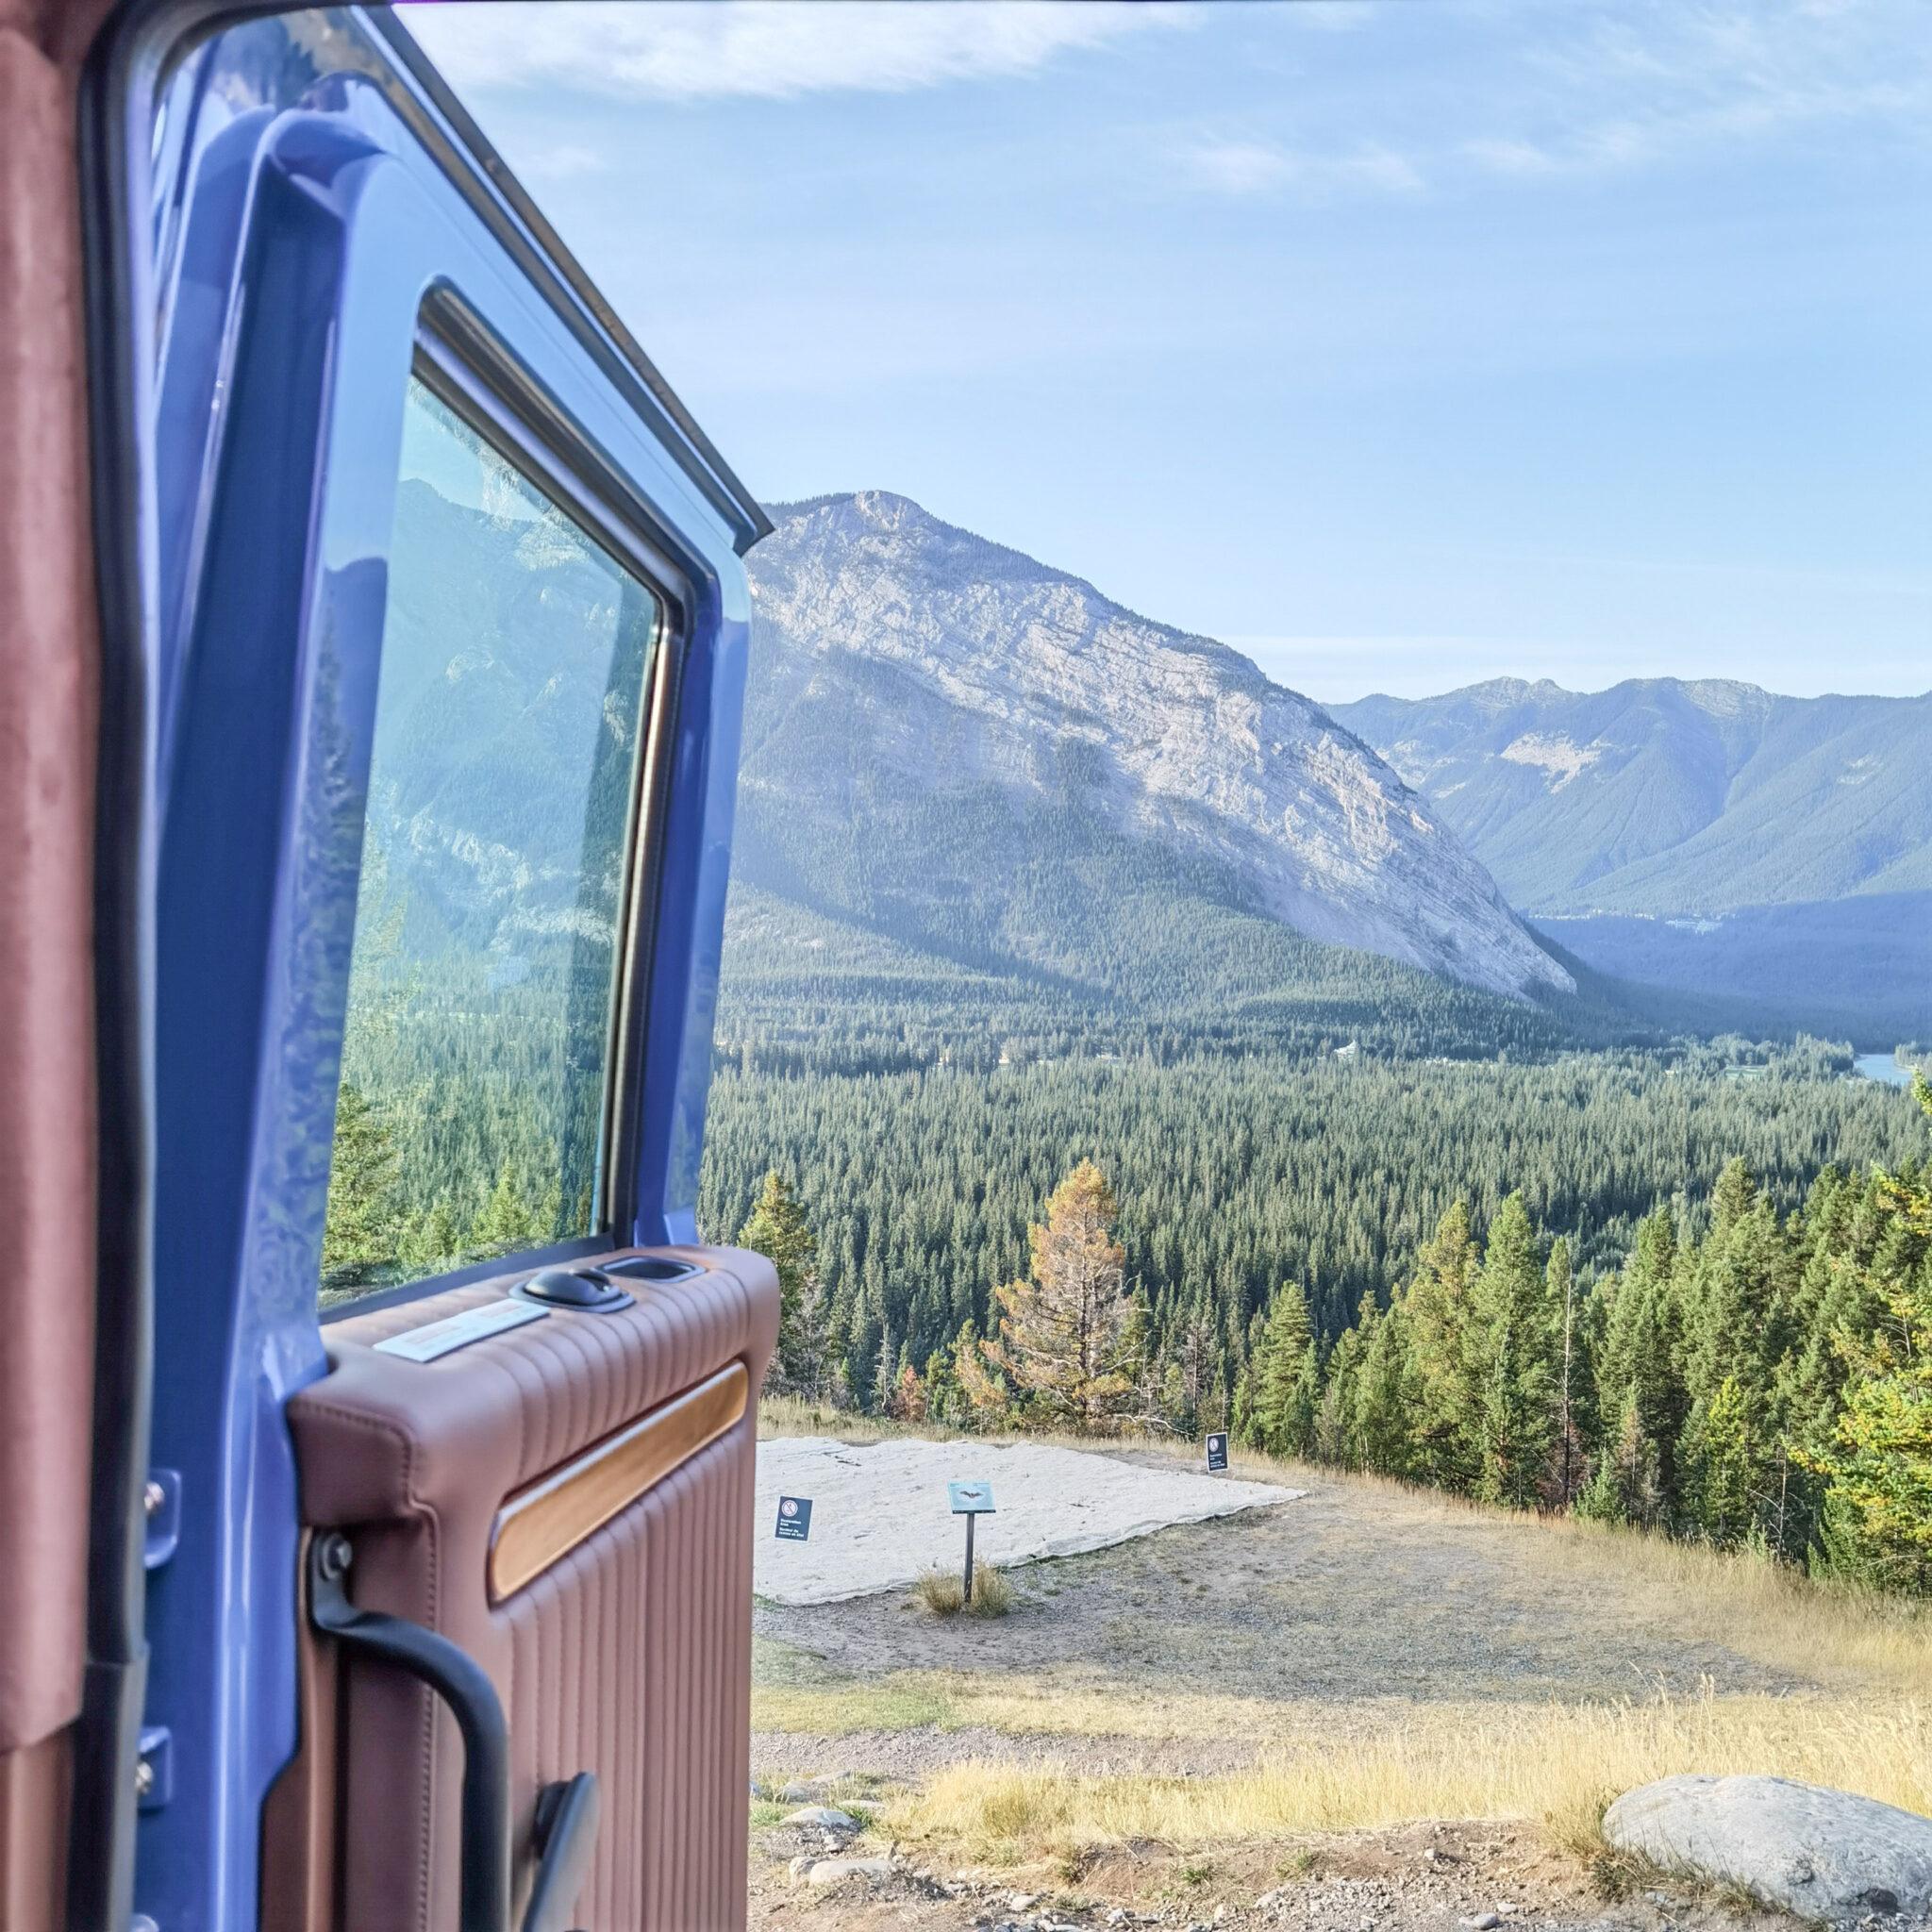 Mount Royal Hotel - Pursuit - Banff - Canadian Rockies - Open Top Touring - Open Door to Nature